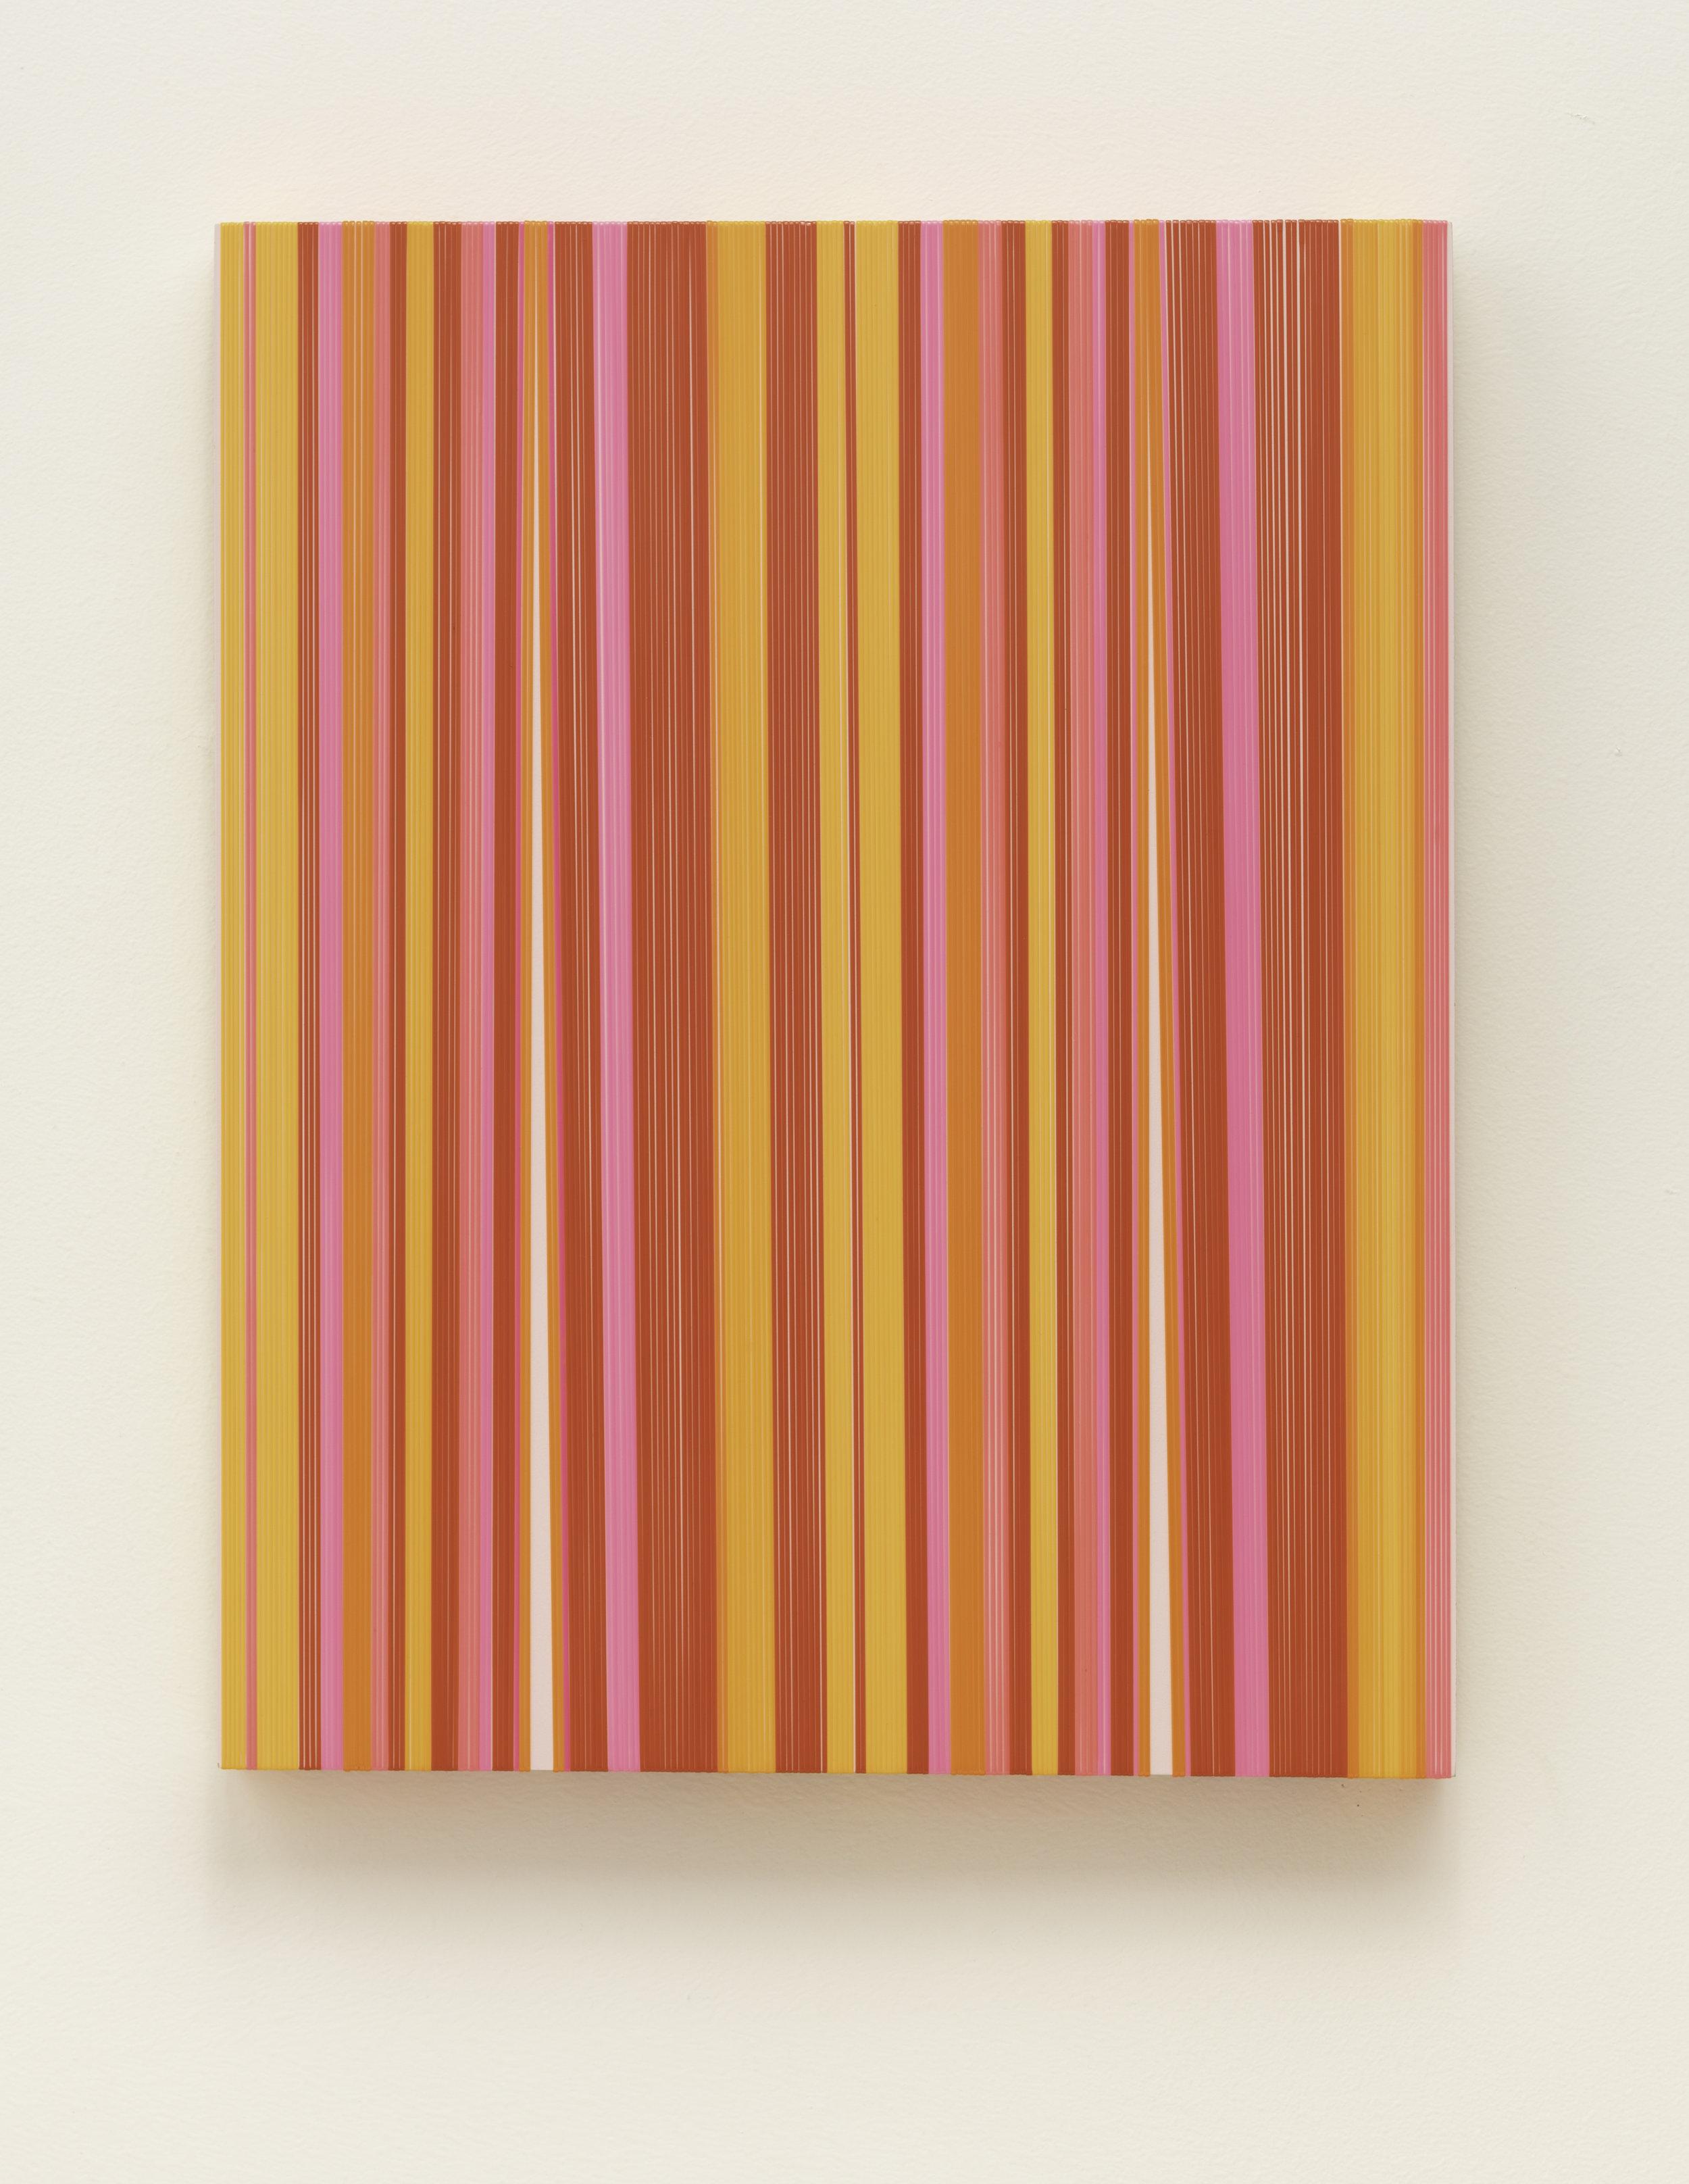 Daniel Bruttig, Pink Pines, 2019. Lanyards on panel, 20 x 16 in